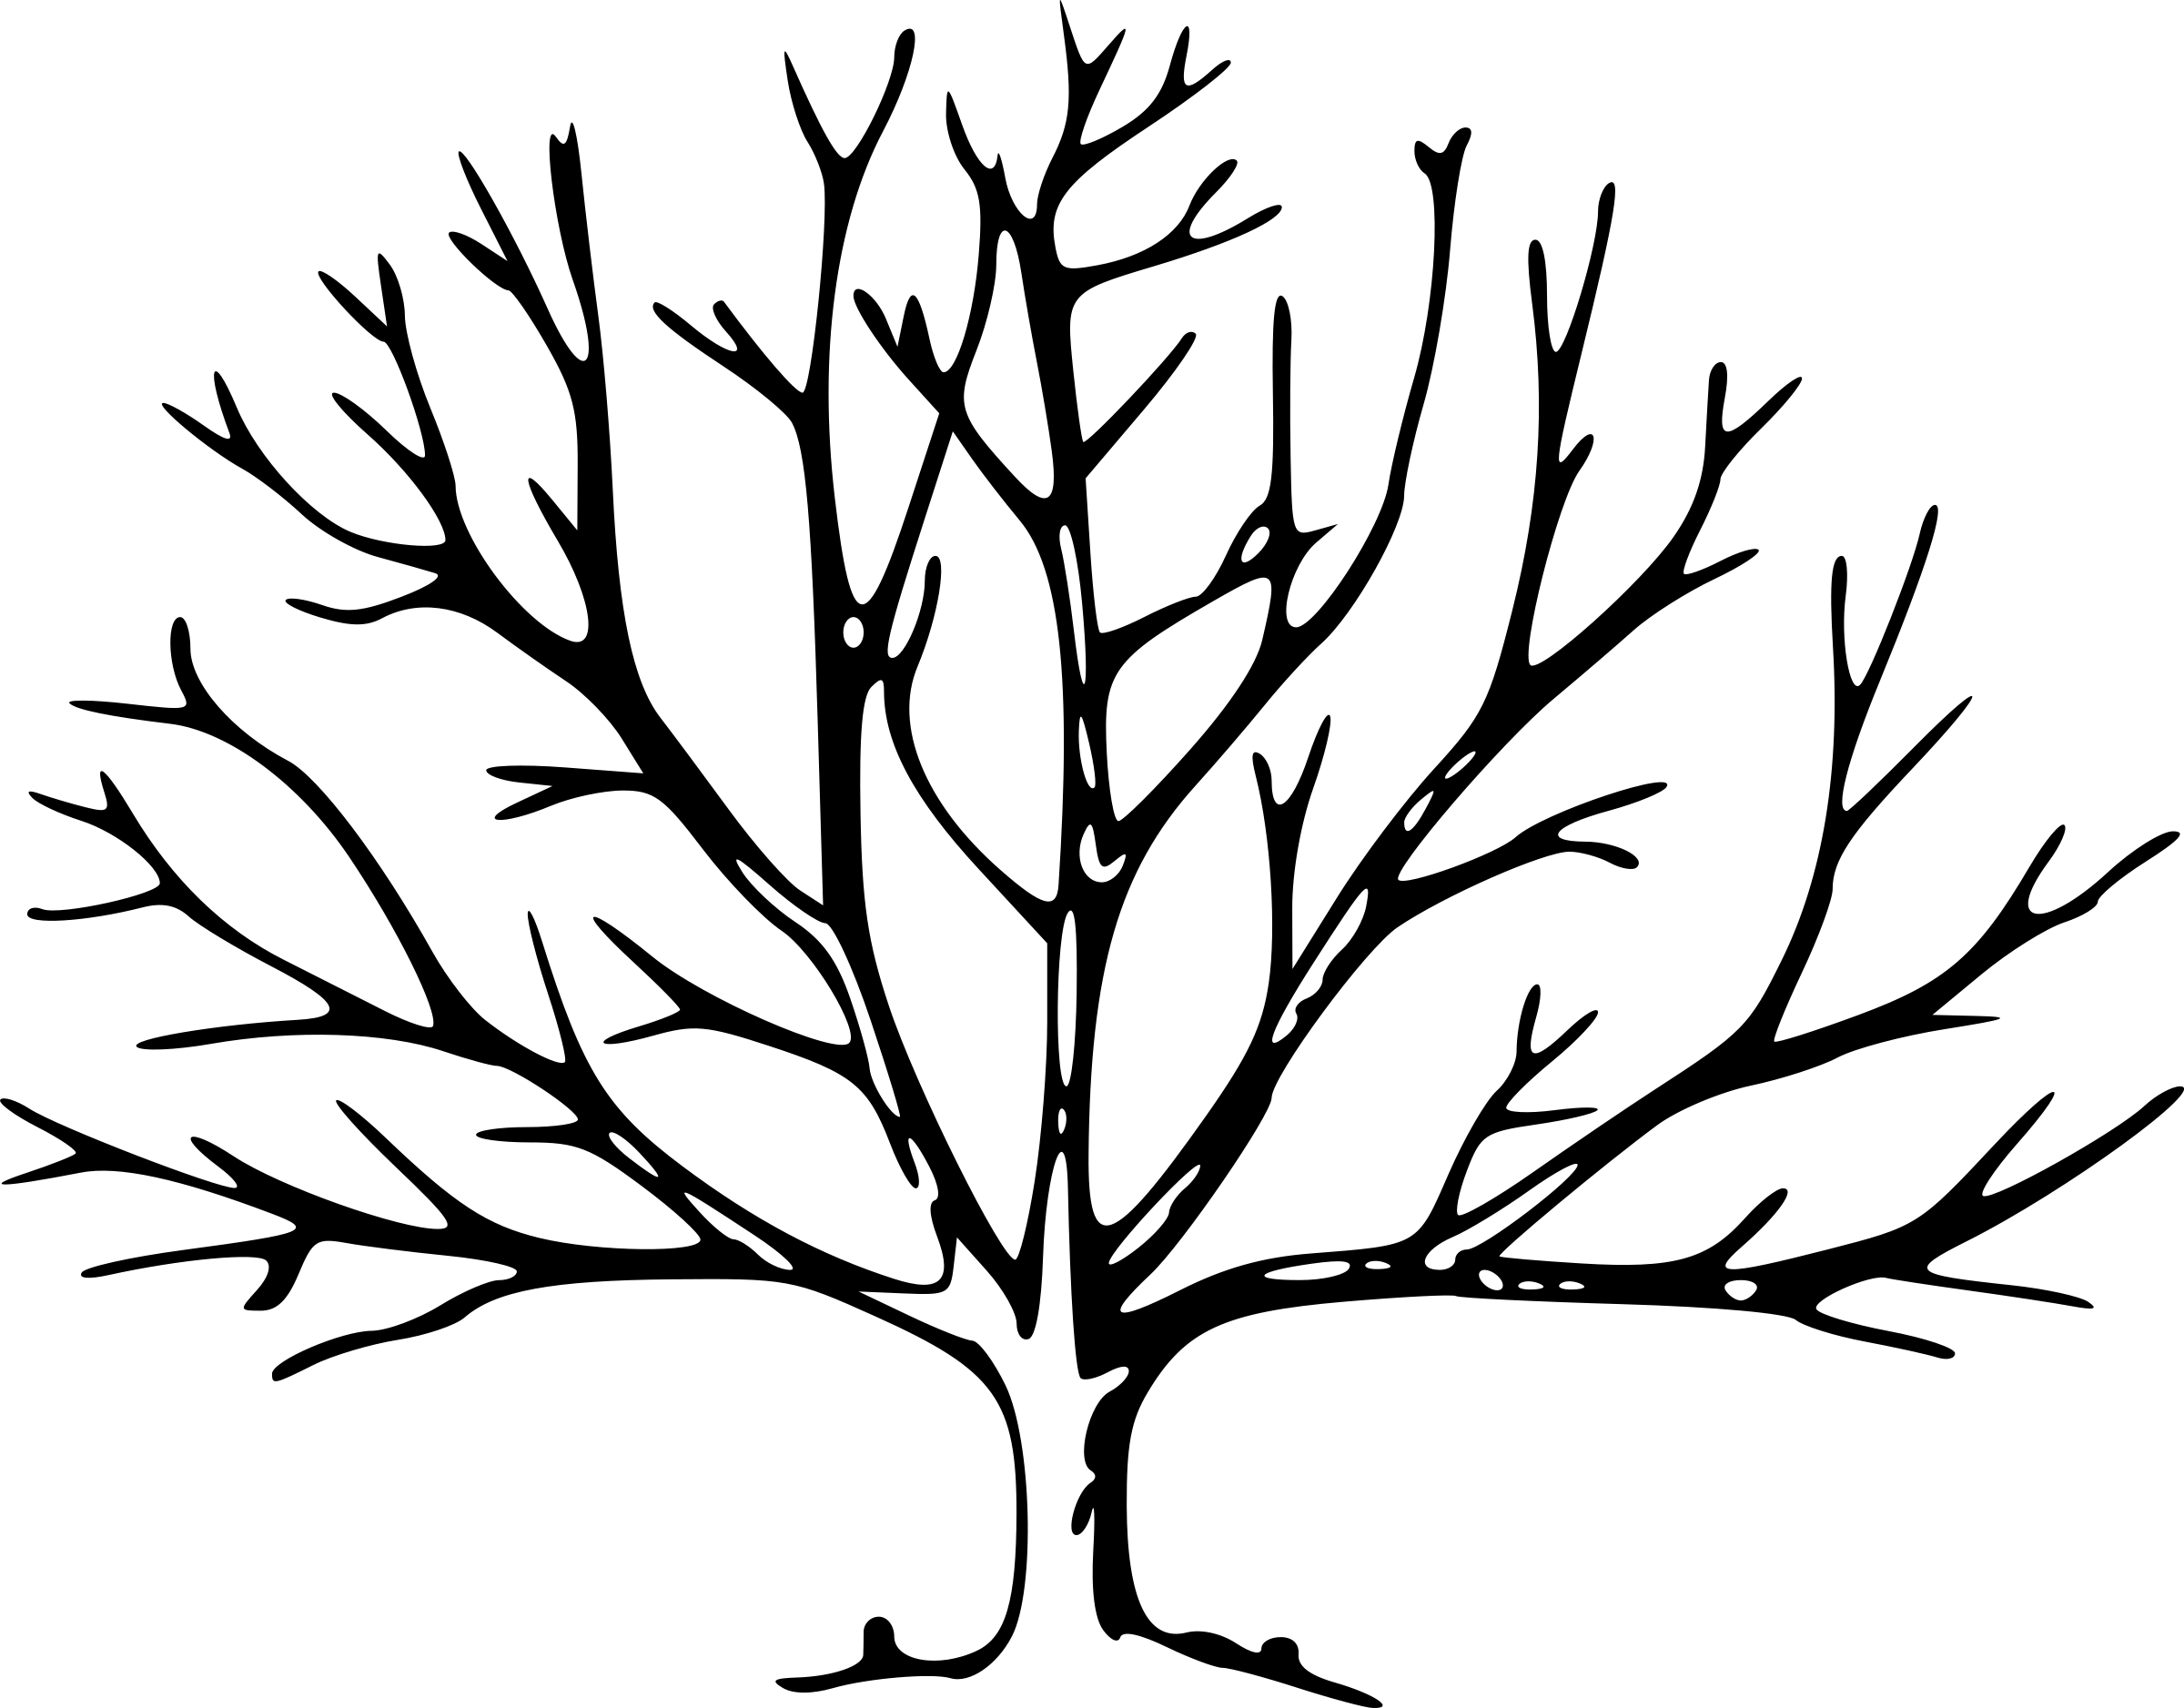 jpg transparent Tree Drawing Clipart at GetDrawings